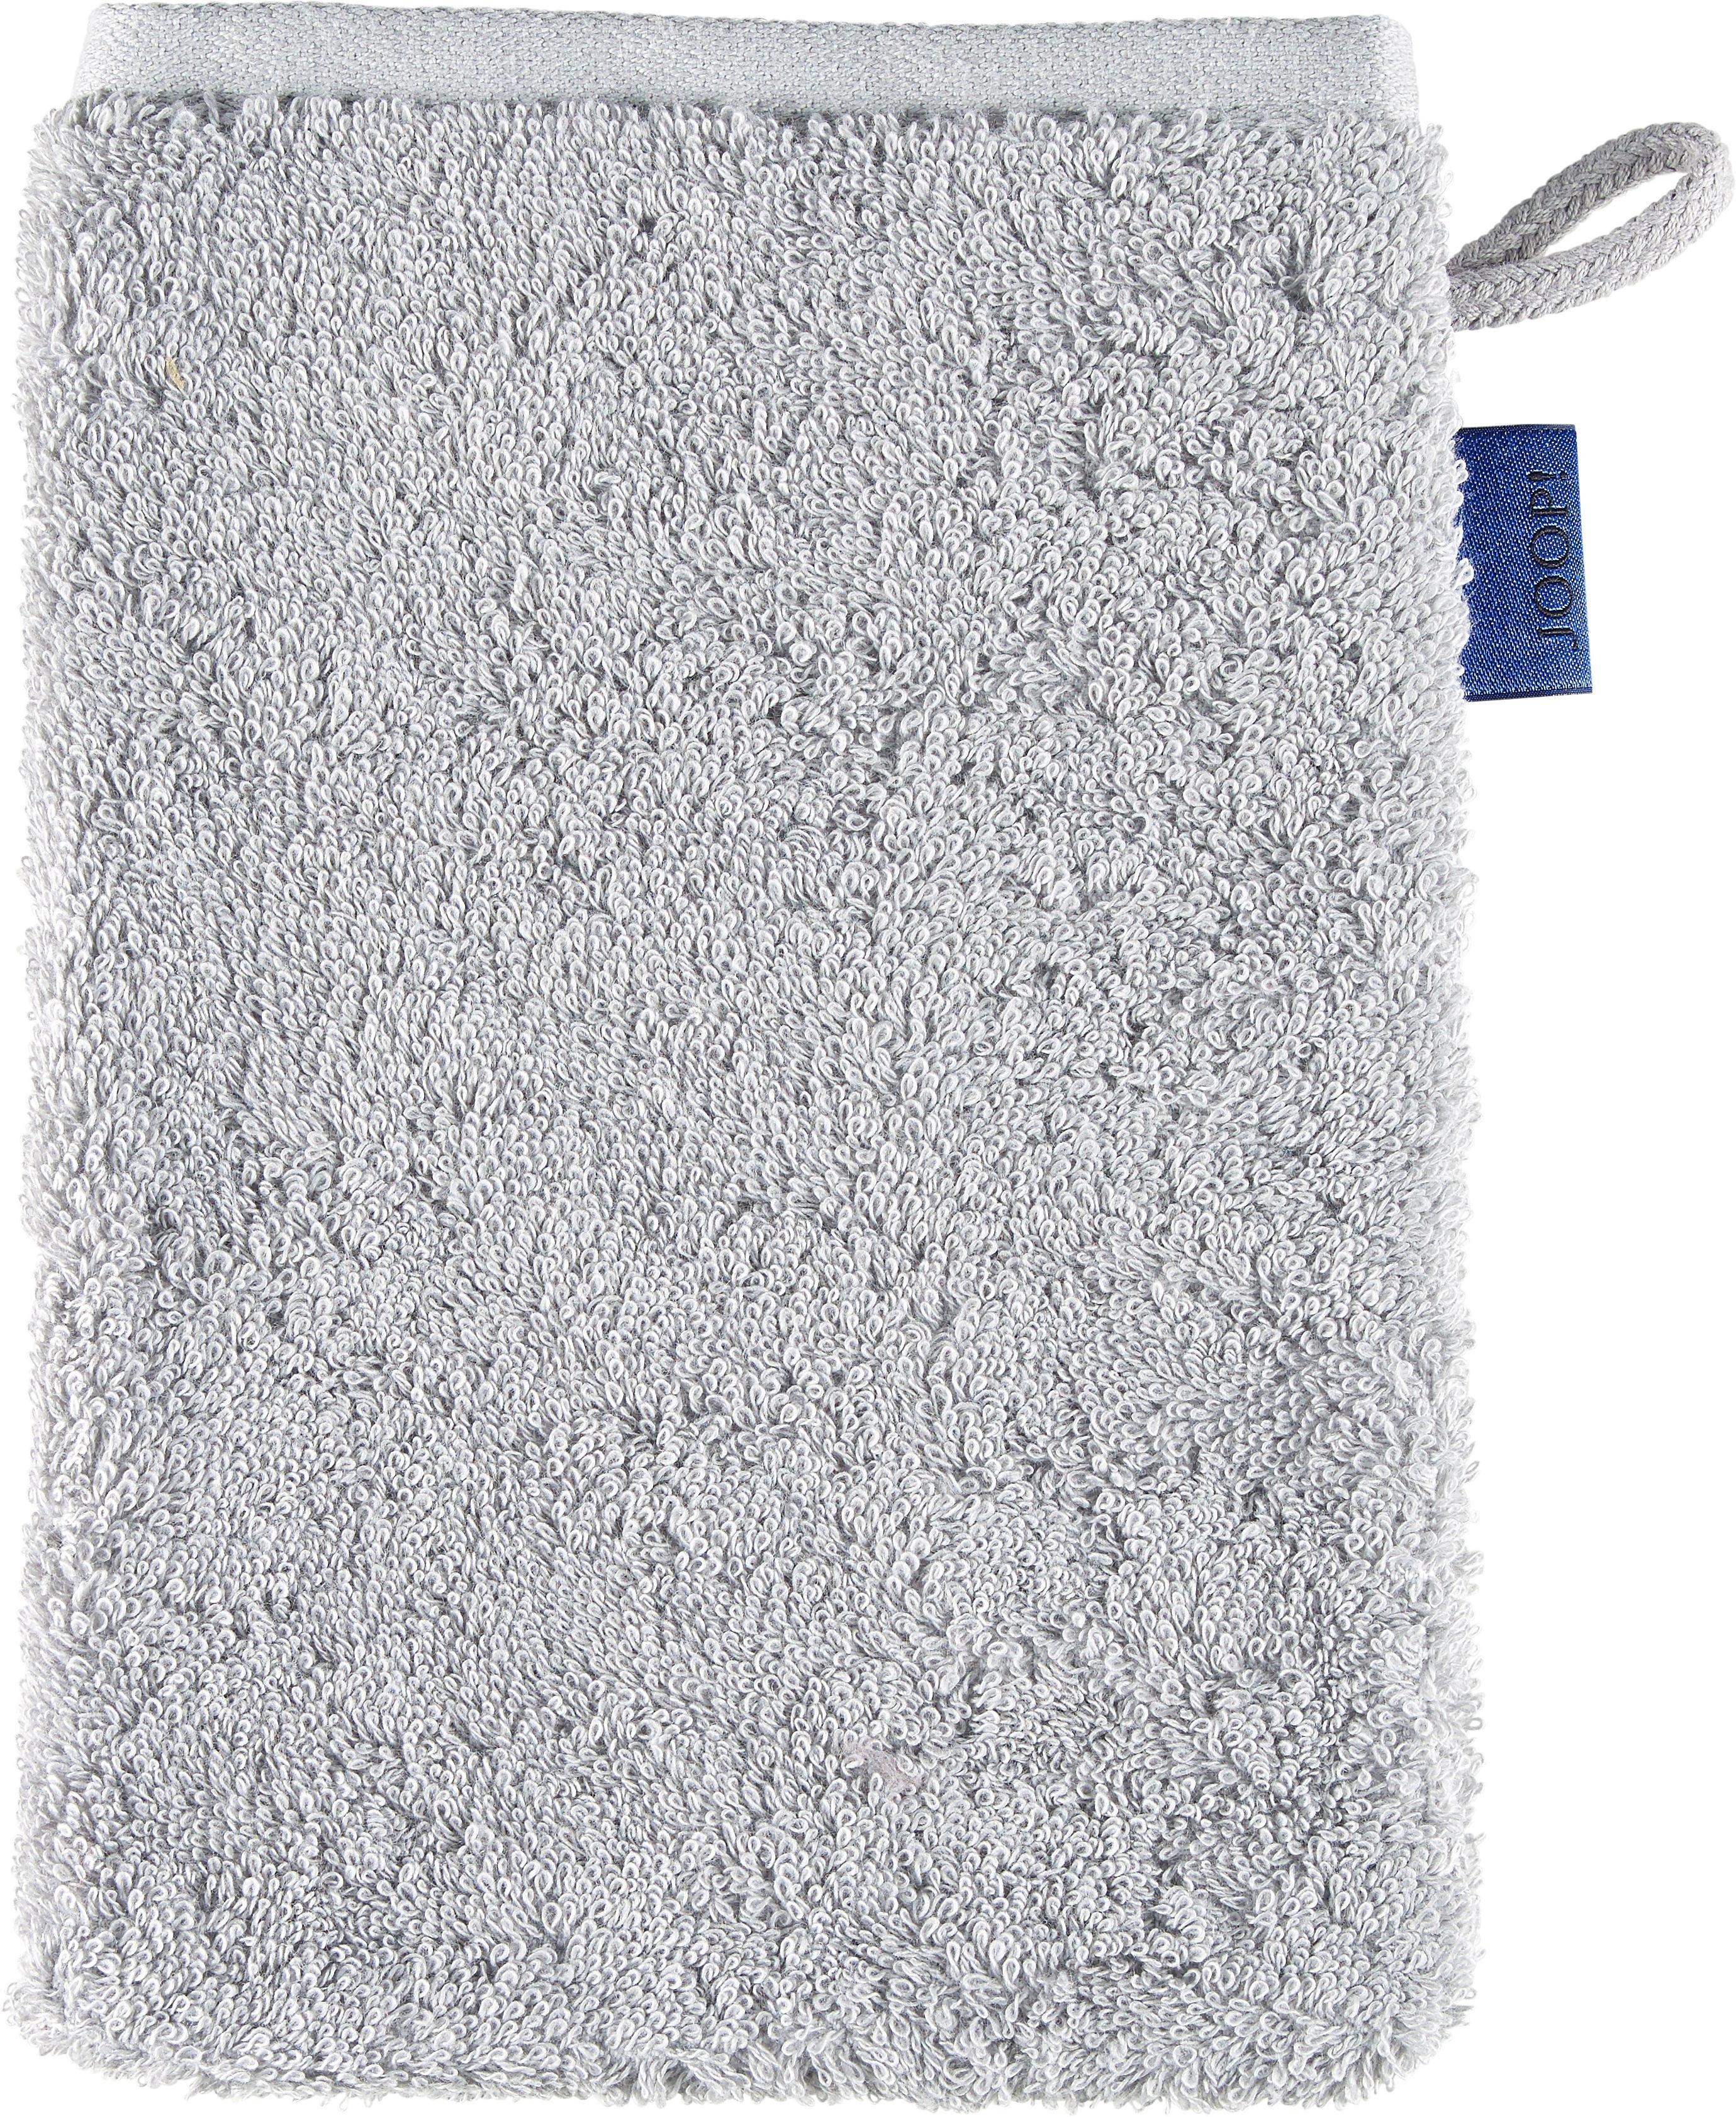 WASCHHANDSCHUH - Hellgrau, Basics, Textil (16/22cm) - JOOP!